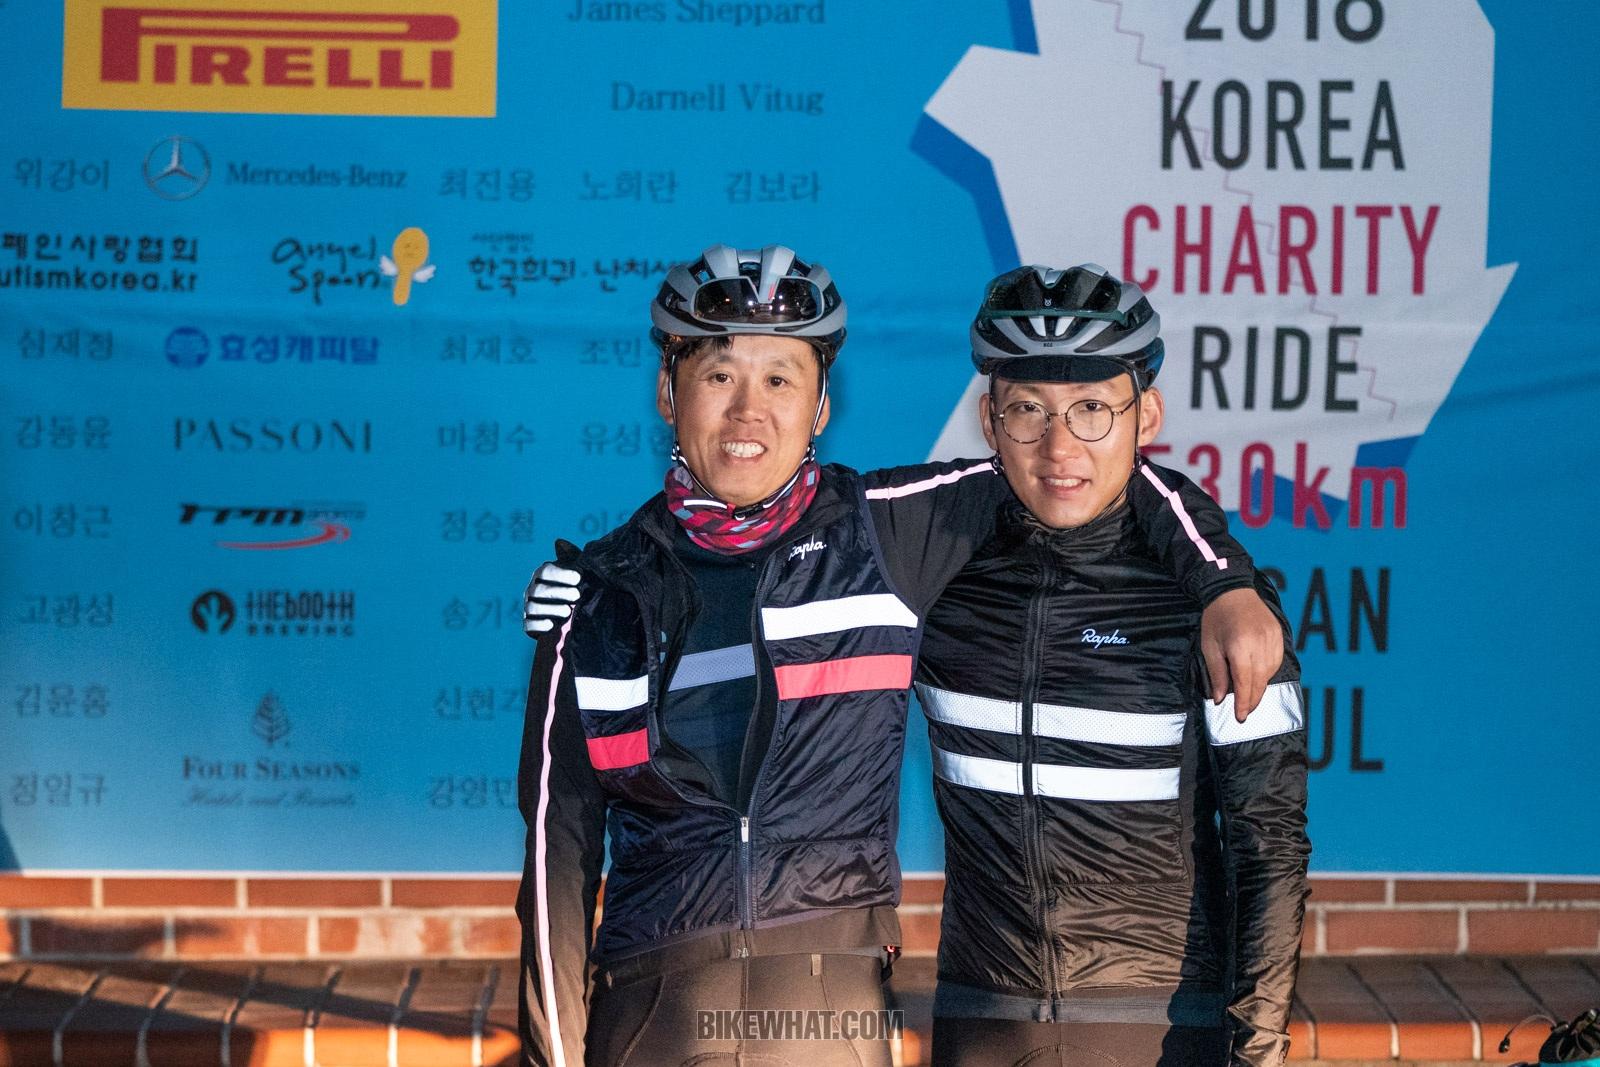 Charity_ride_2018 (7).jpg